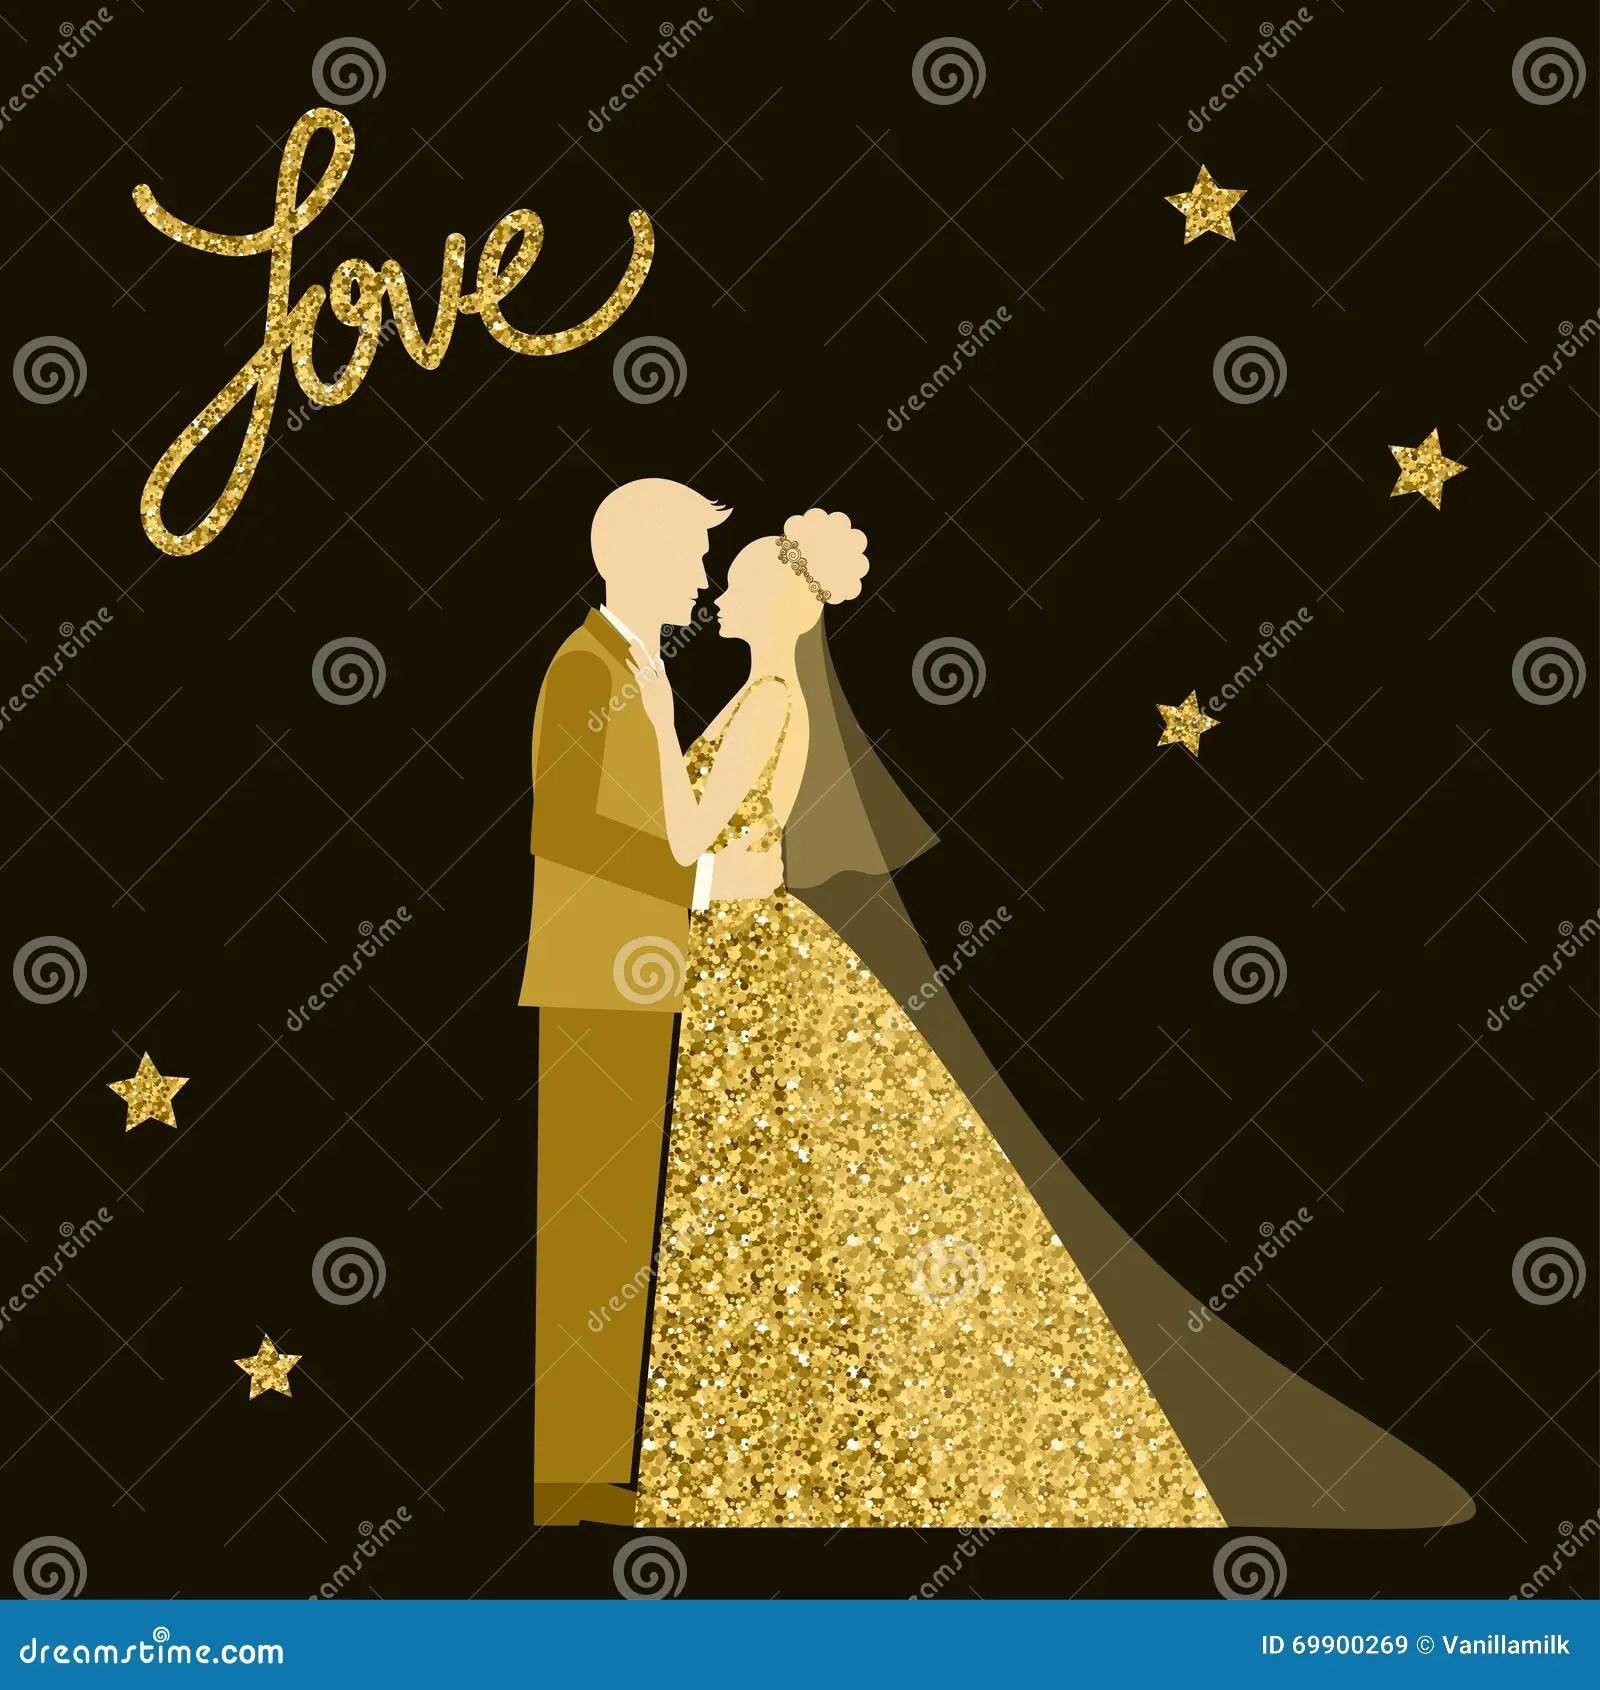 Wedding Theme Bride And Groom Golden Sparkle Glitter